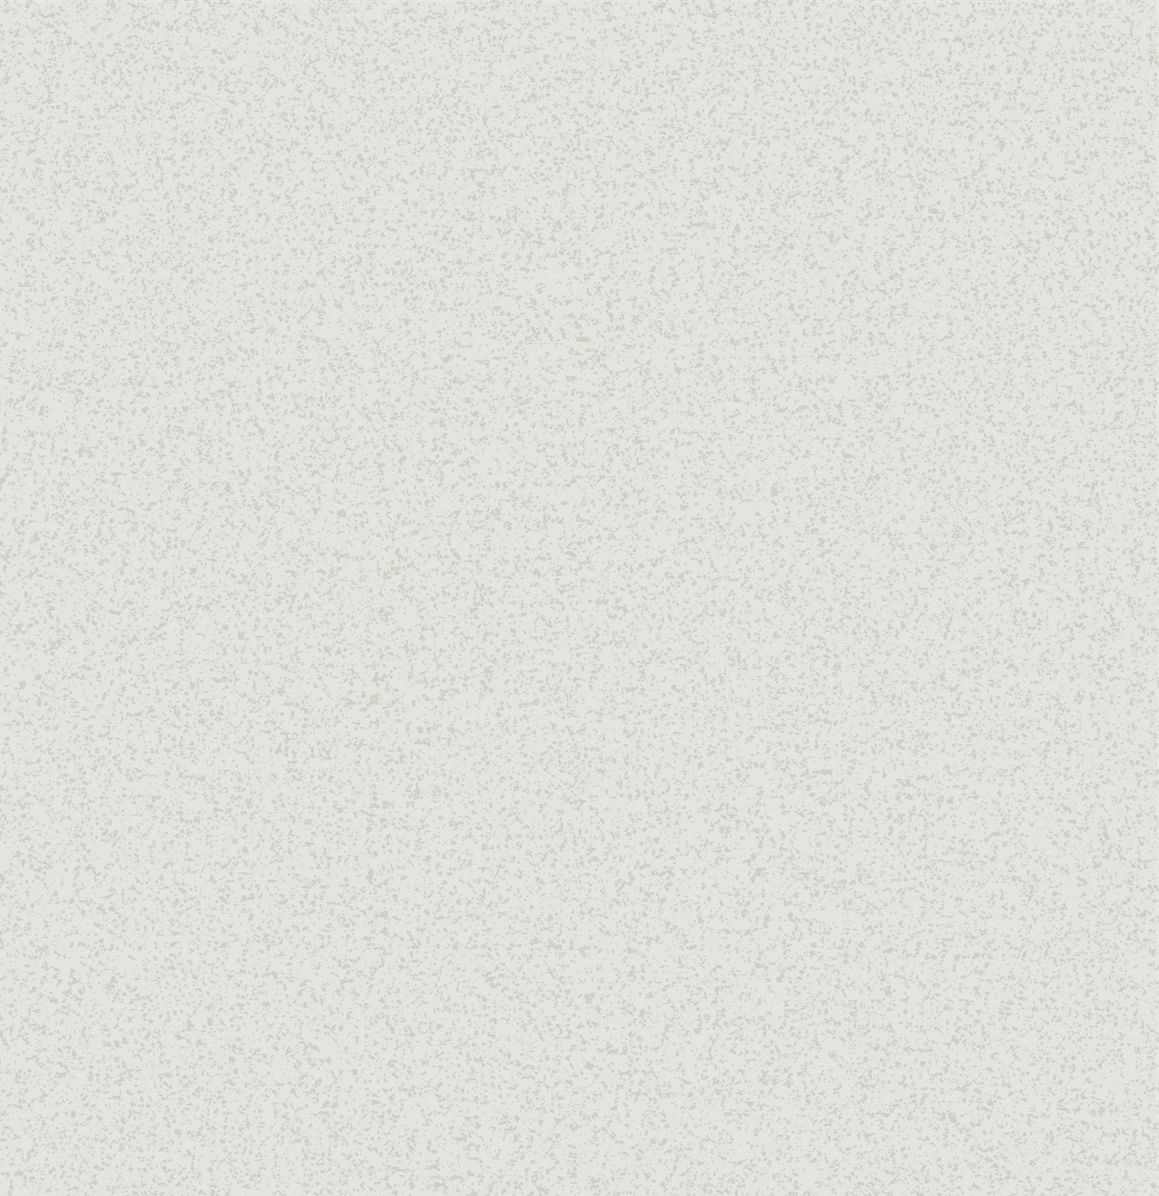 Papel de Parede Modern Maison Aspecto Cimentado MM558002 - Rolo: 10m x 0,52m